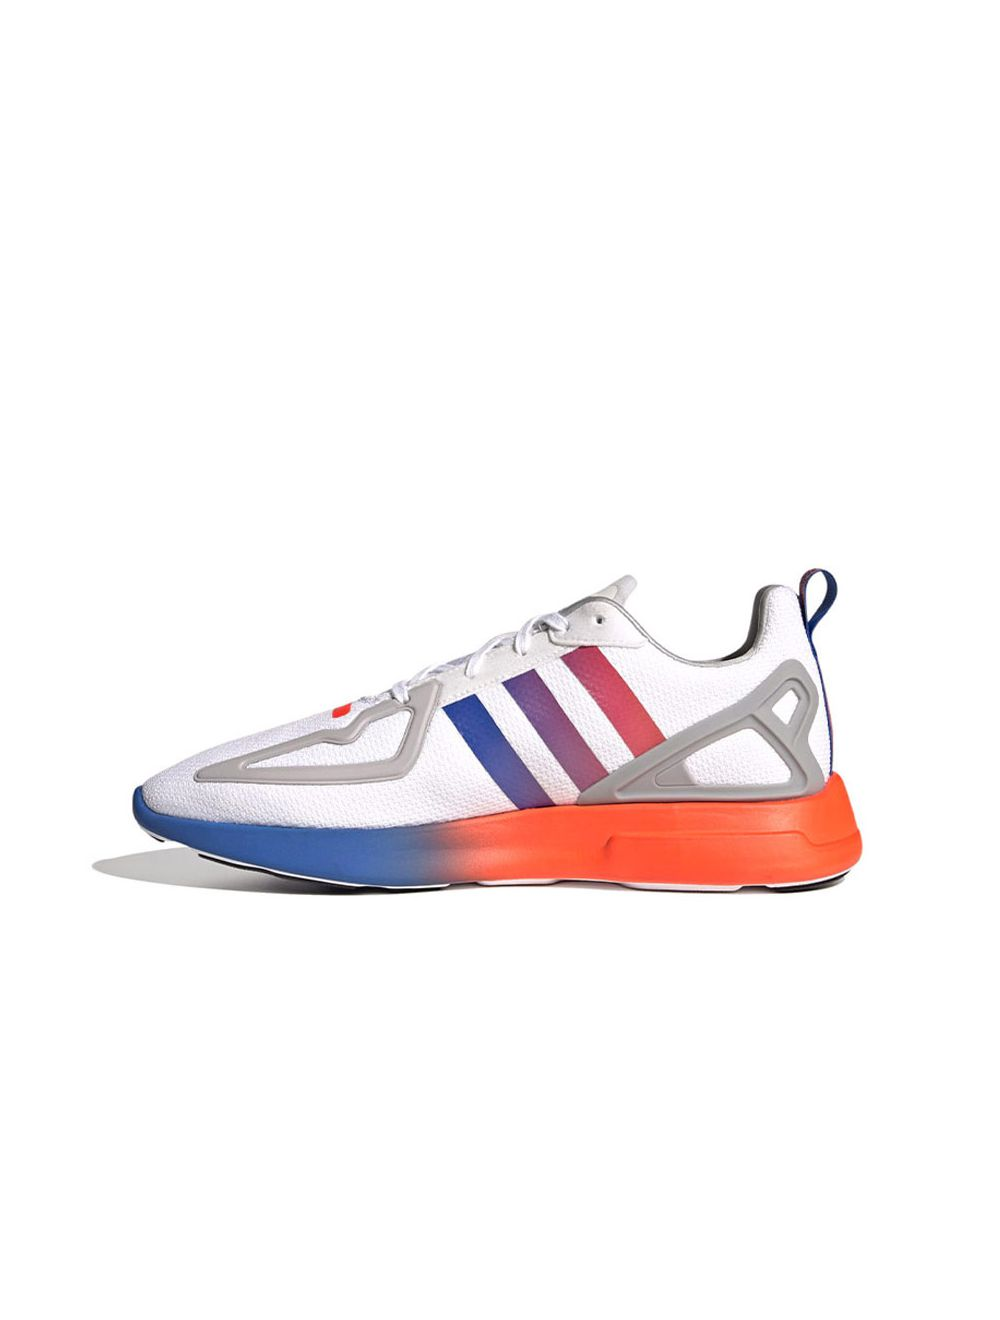 adidas zx flux grey mens